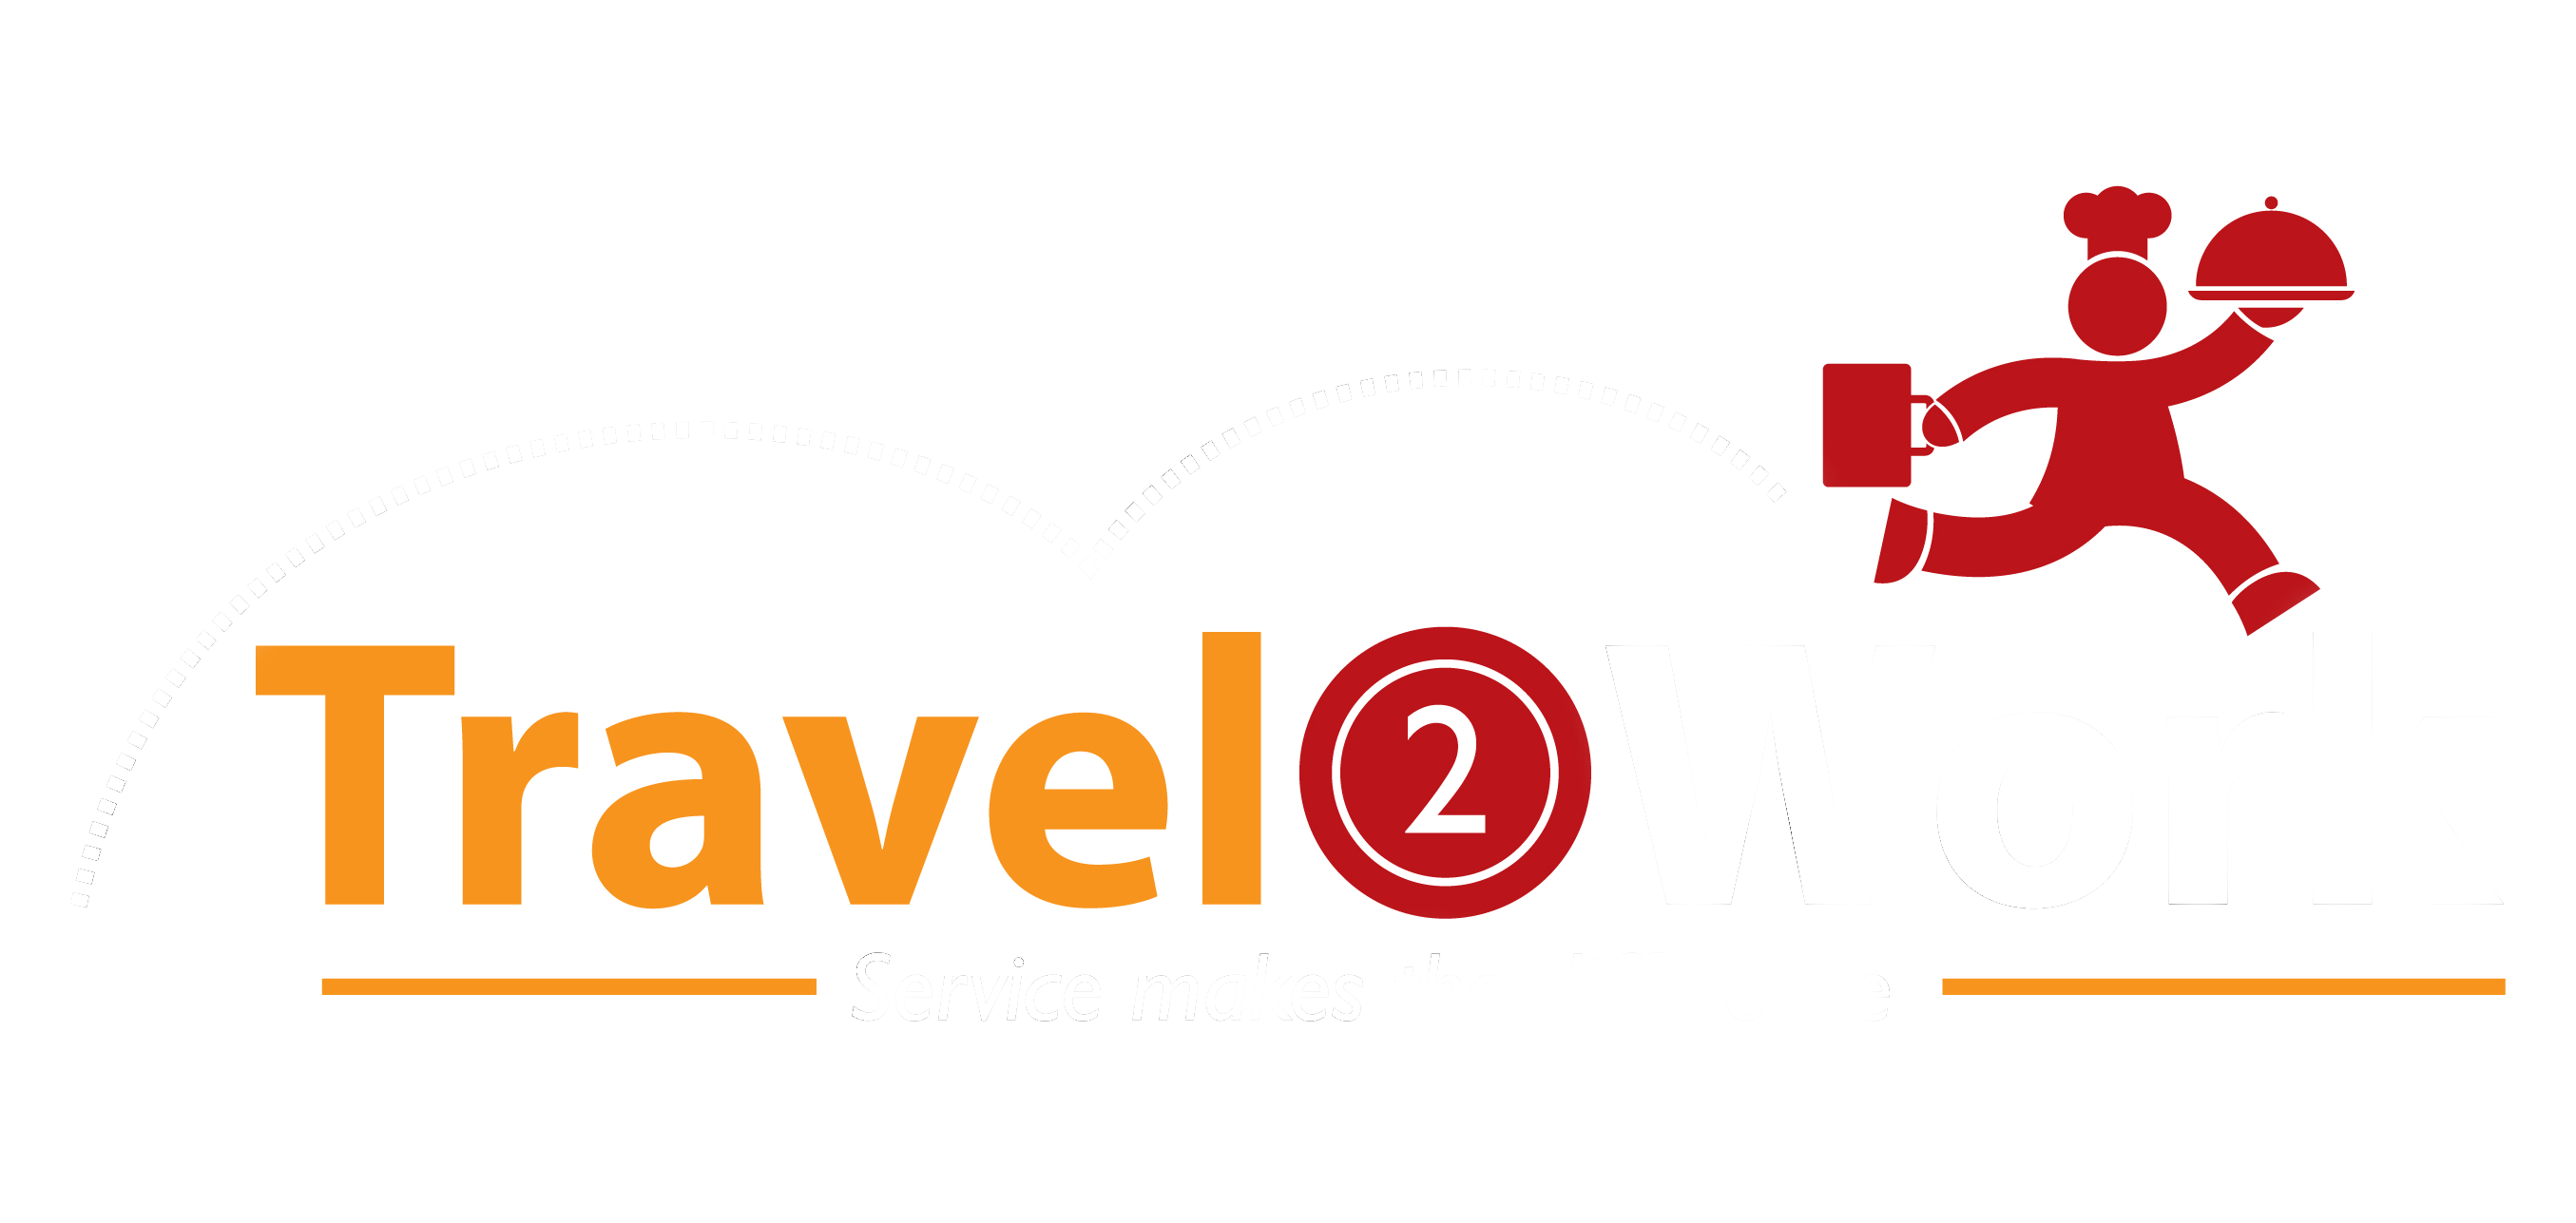 travel2work